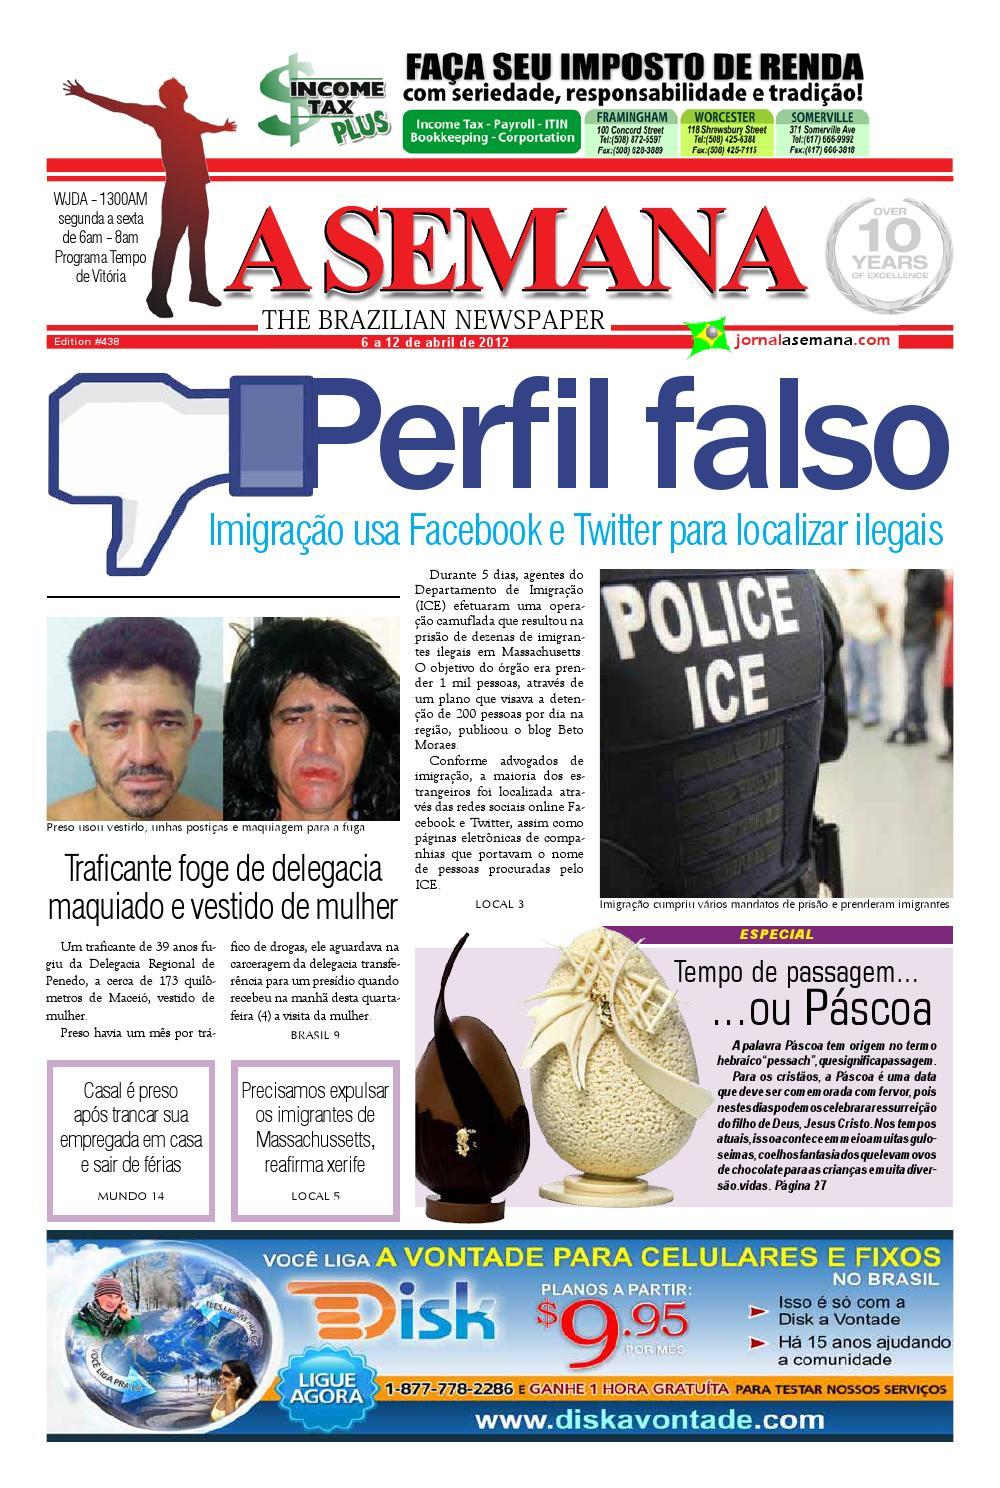 cdefe144c A SEMANA - The Brazilian Newspaper by JORNAL A SEMANA - issuu